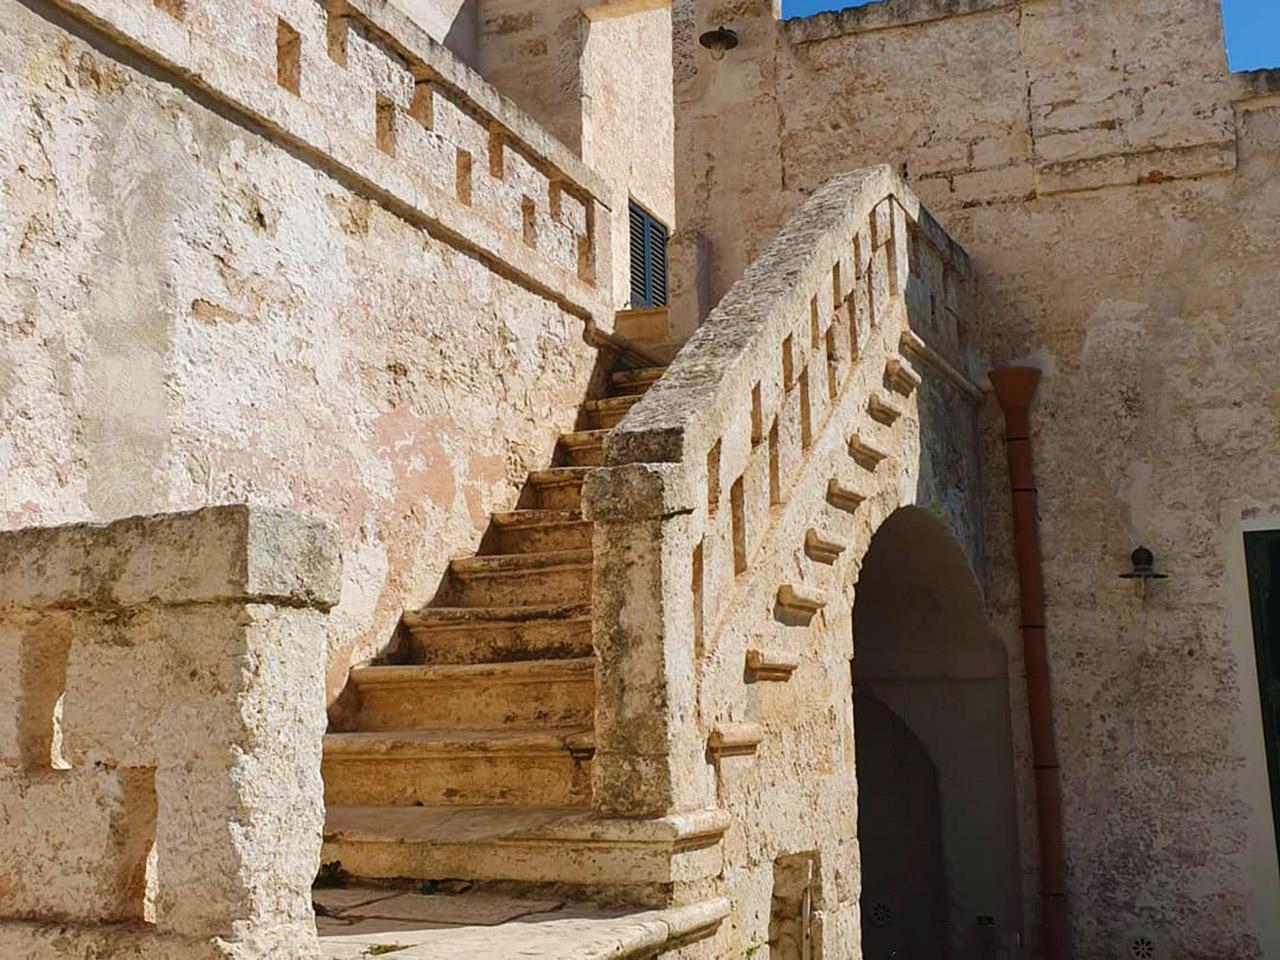 costruzioni restauri sirio ostuni restauro ristrutturazione masseria mangiamuso ostuni img 20190704 133358 794